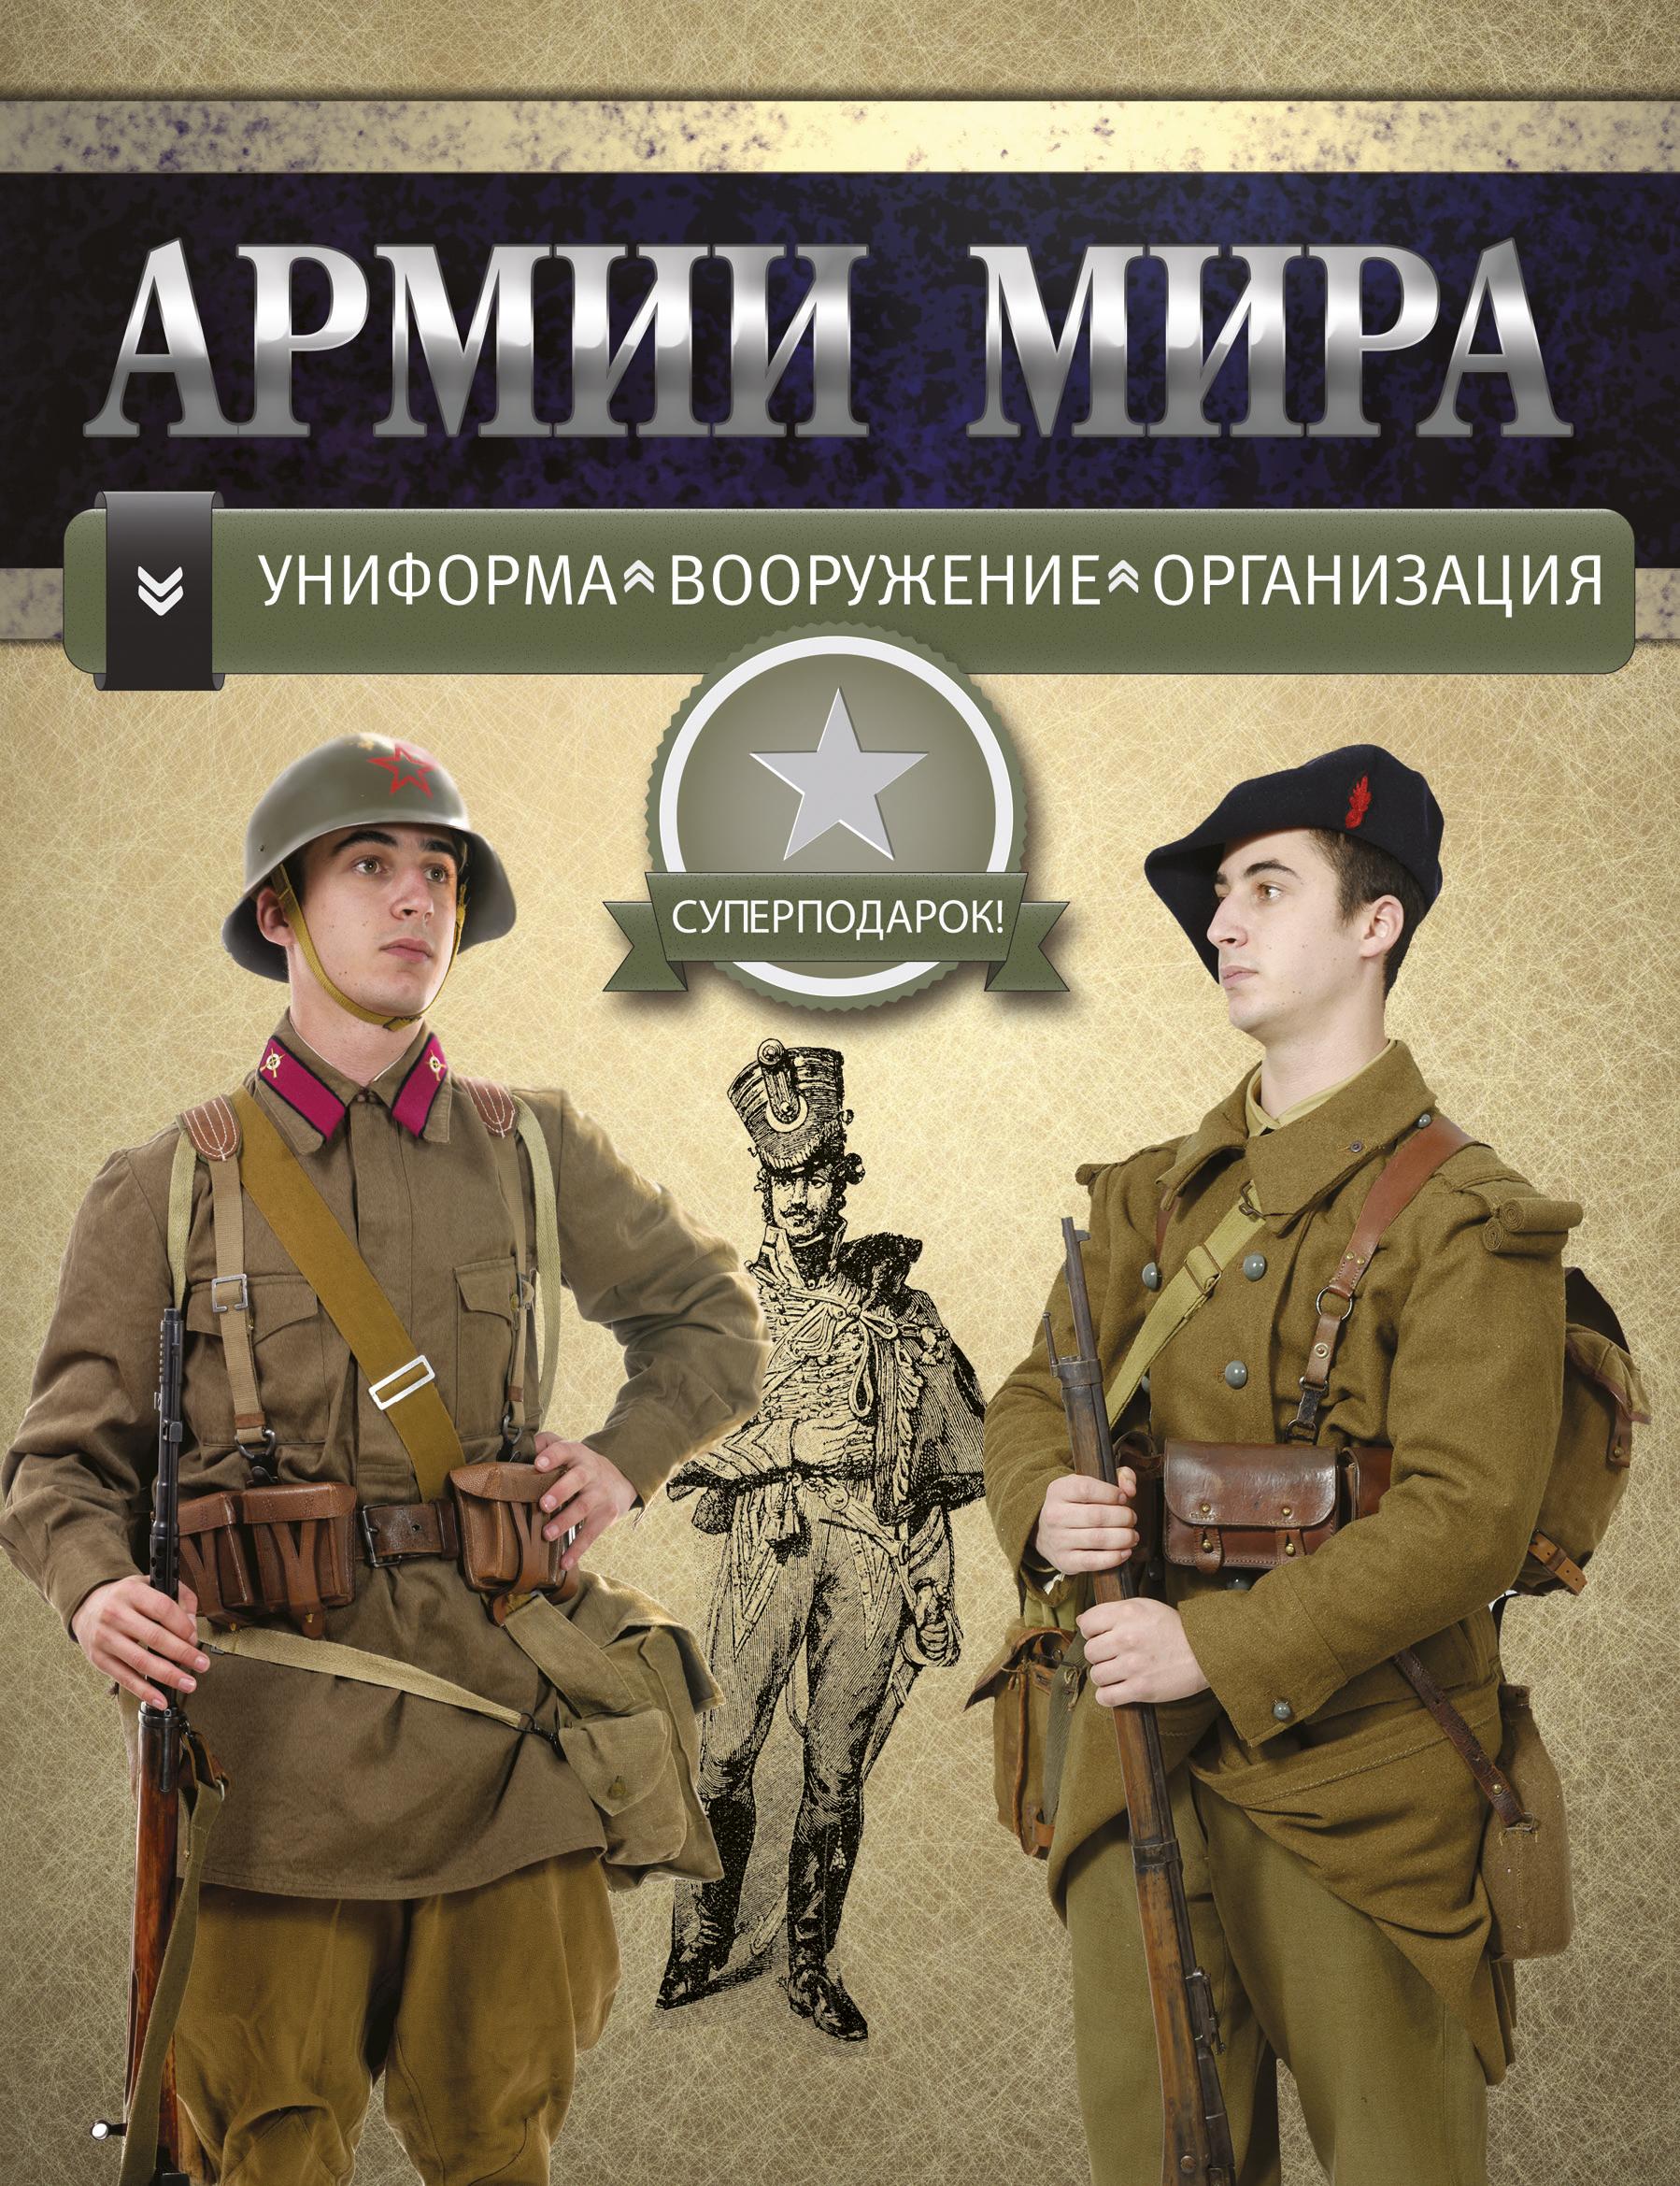 Филип Джоуэтт,М. Генри,М. Брэйли Армии мира. Униформа. Вооружение. Организация